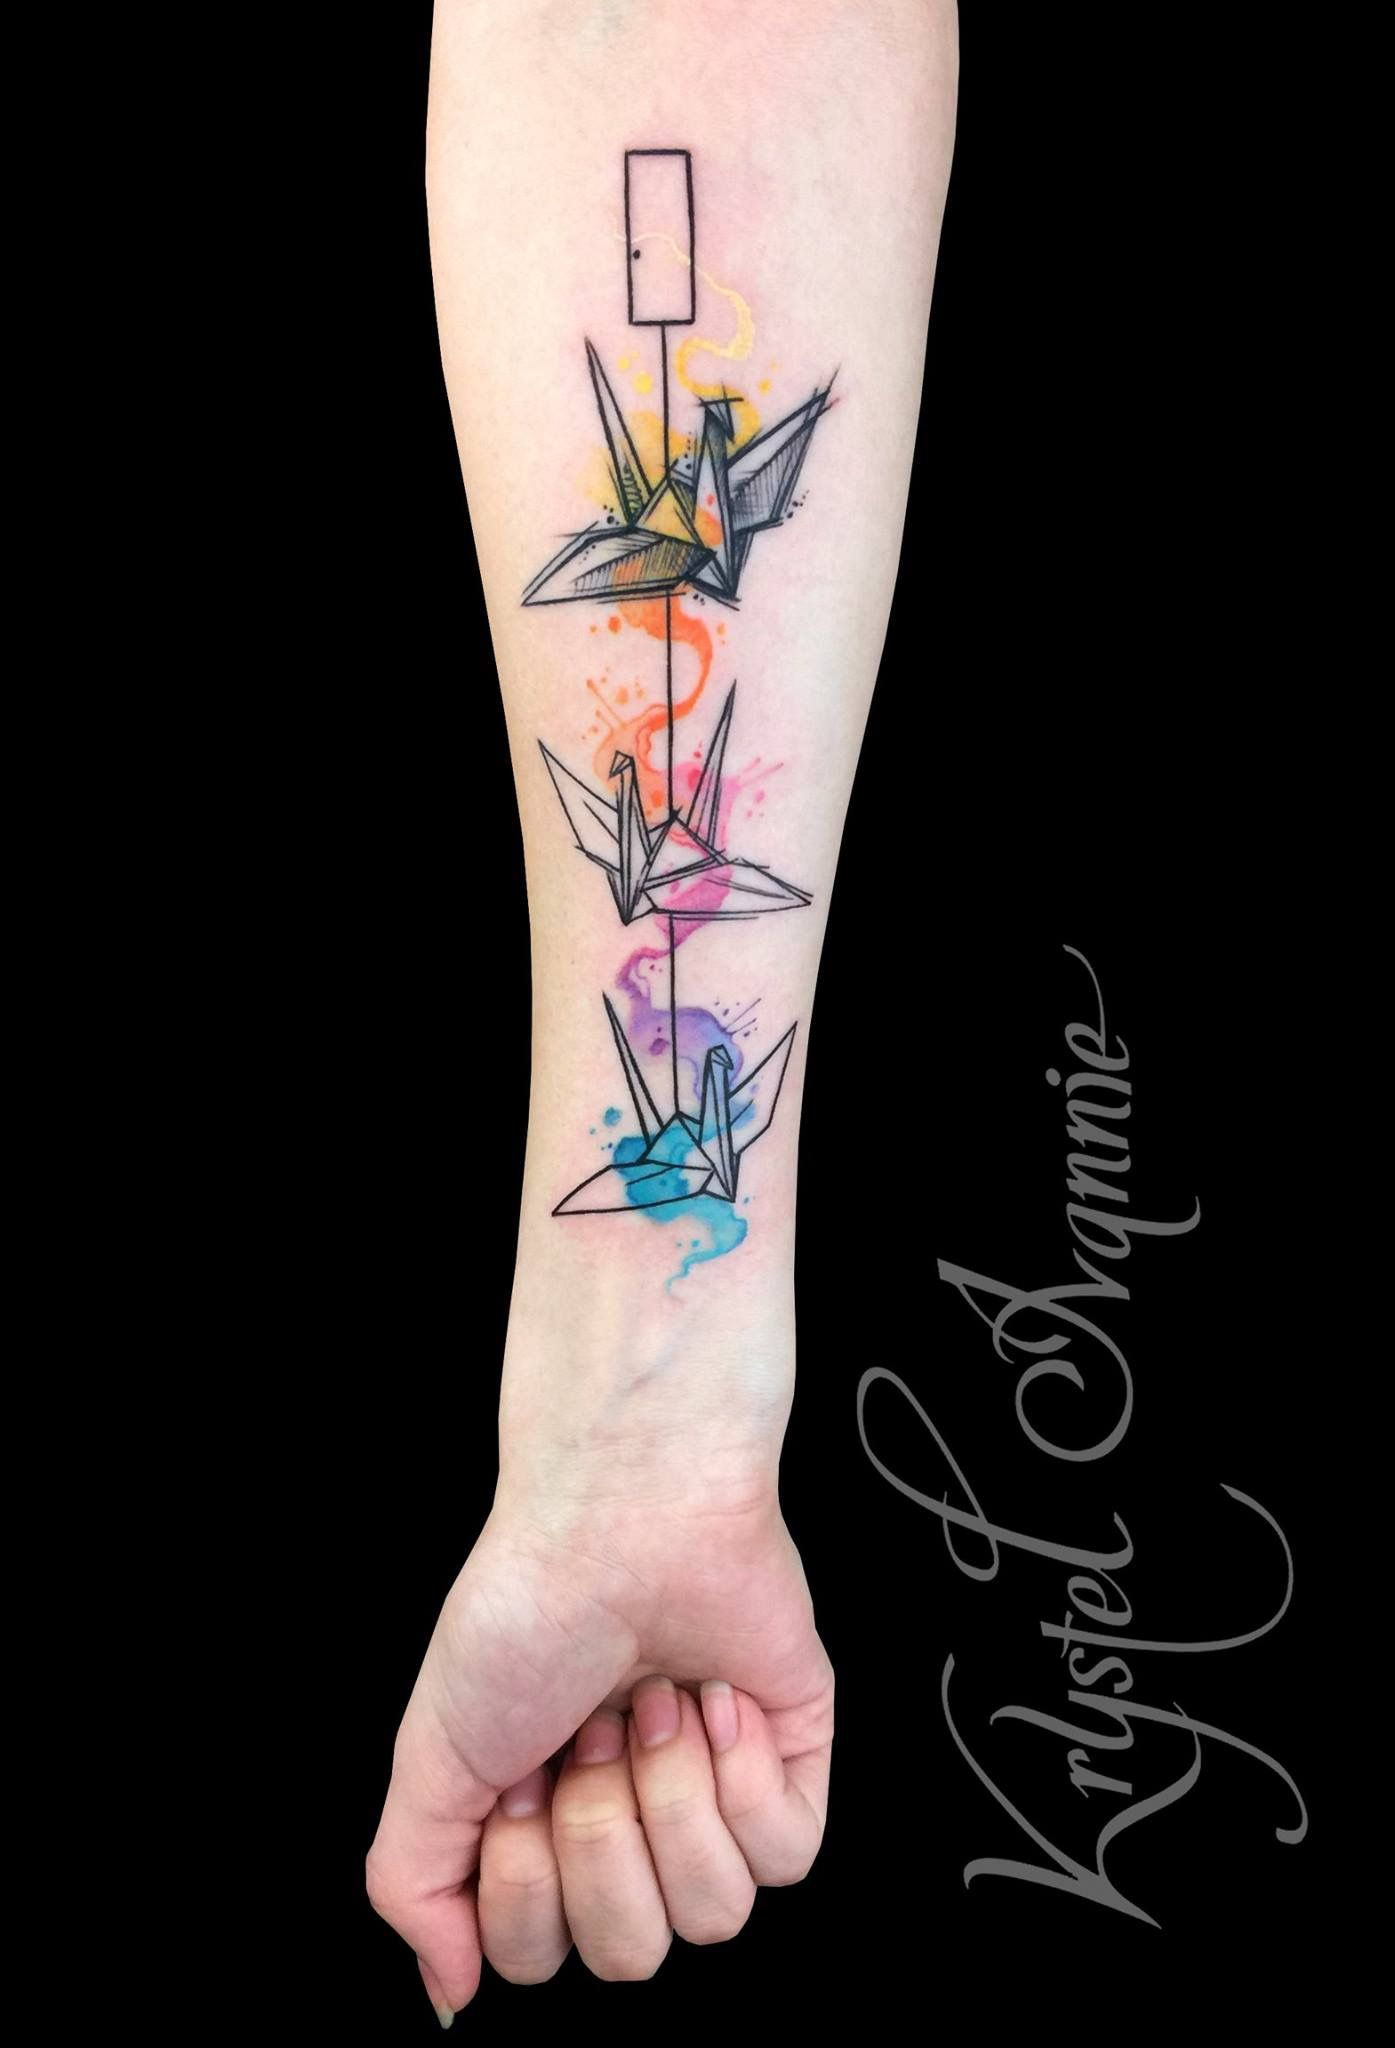 837a96d90 Origami crane tattoo | Tattoos | Origami tattoo, Crane tattoo, Paper ...